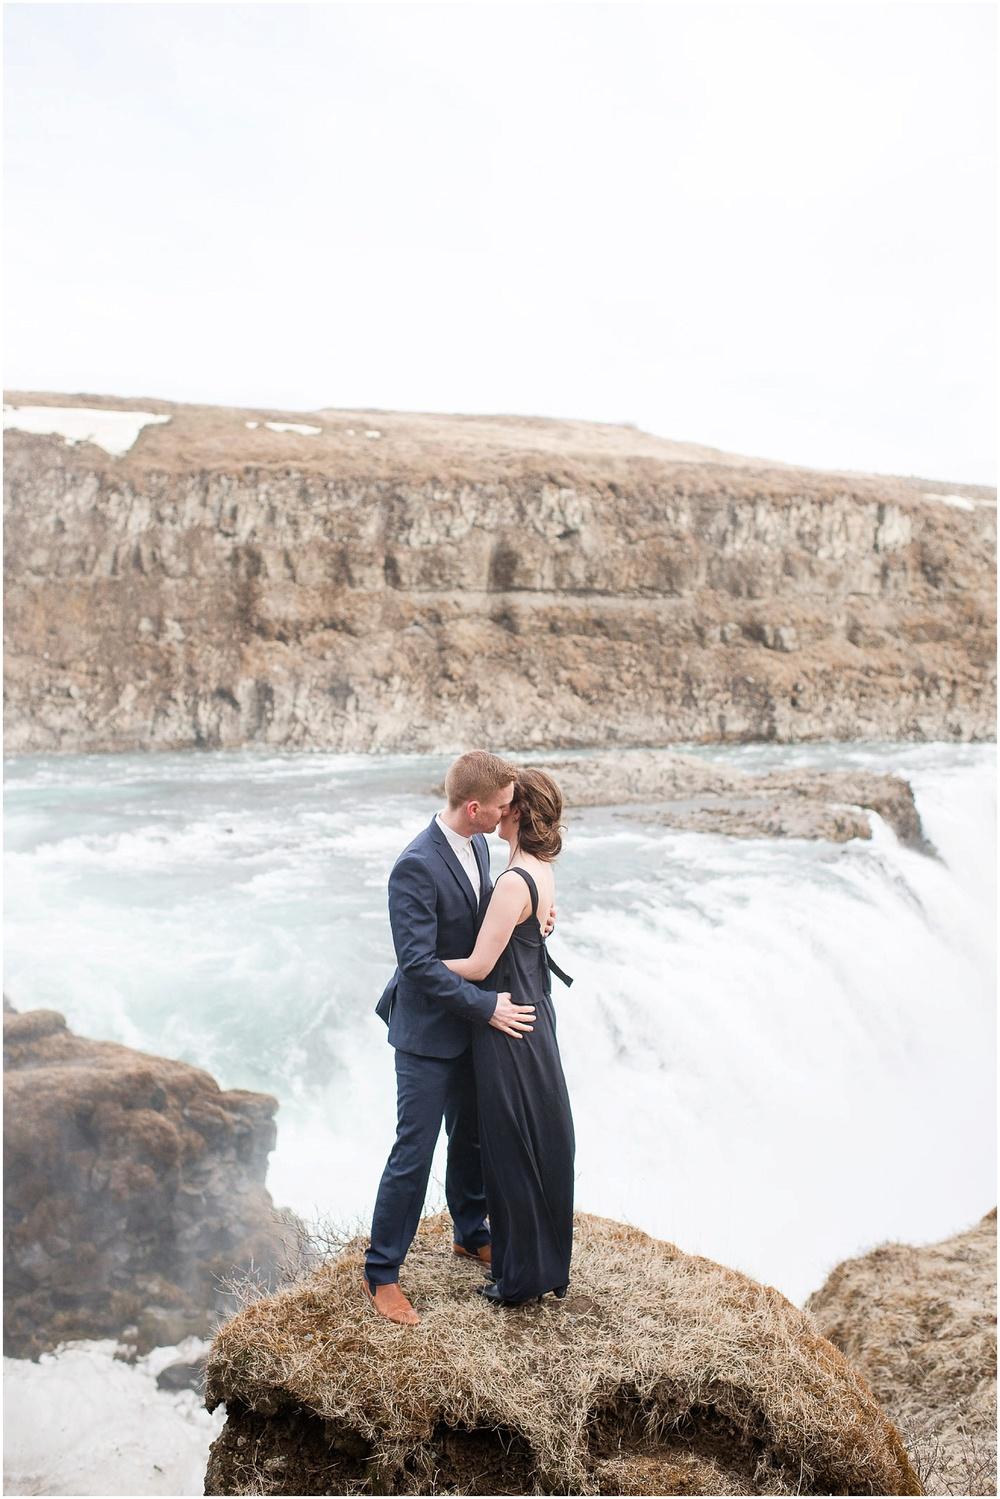 Hannah Leigh Photography Iceland Elopement Photographer_0122.jpg